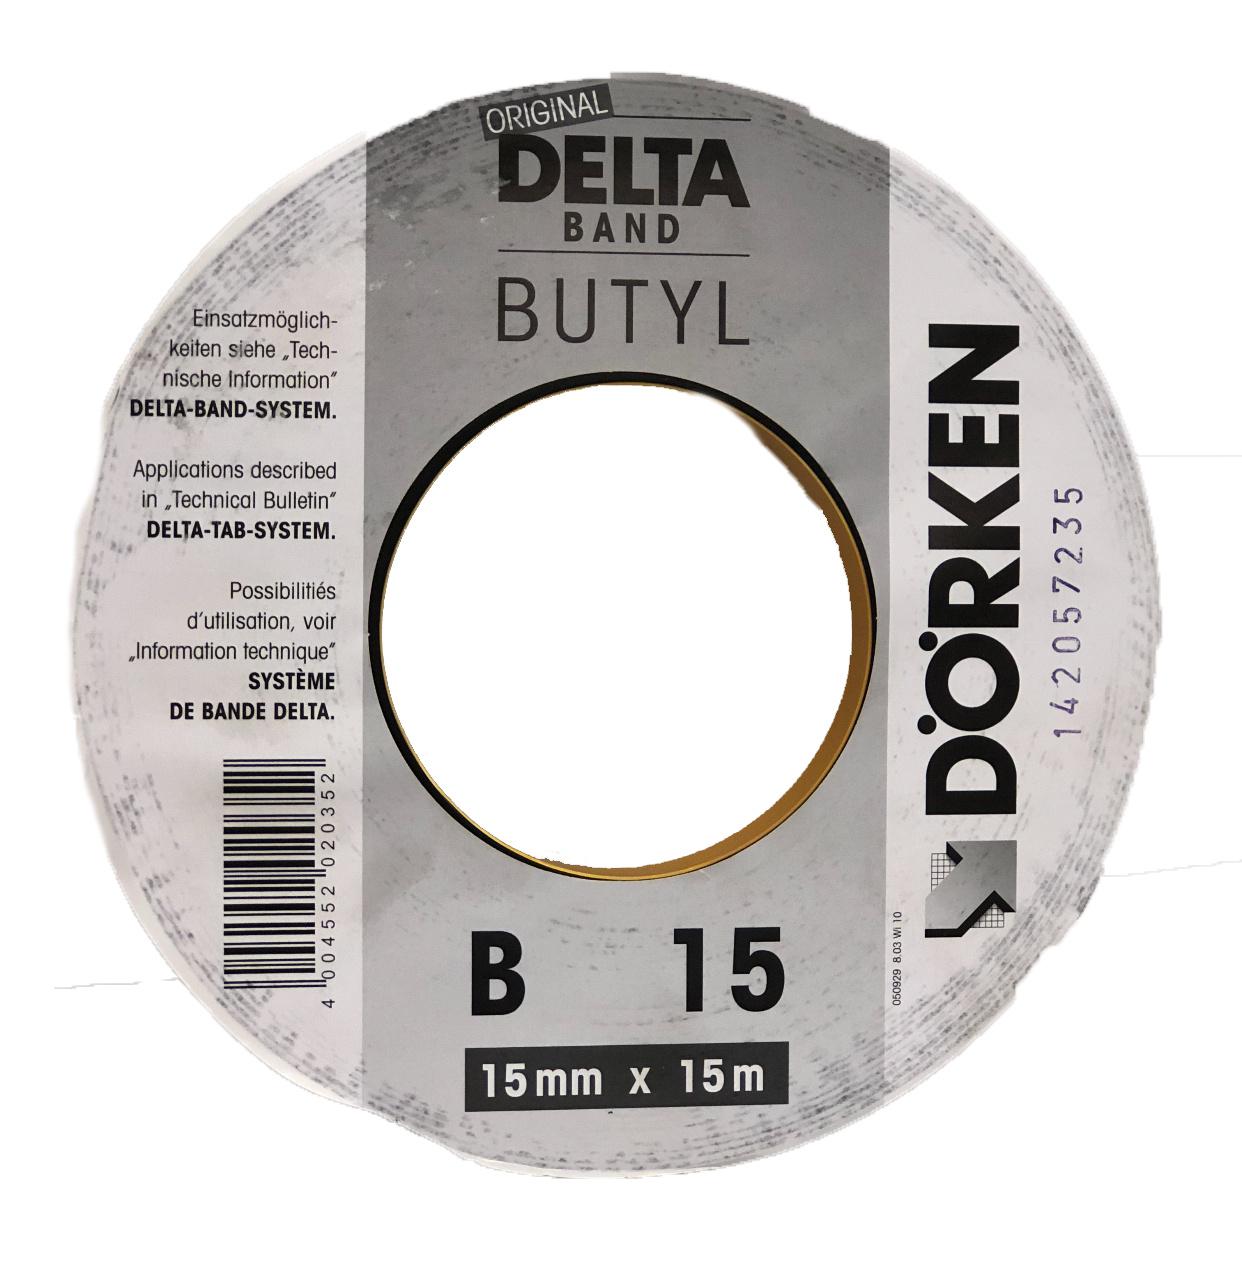 Delta Band Butyl